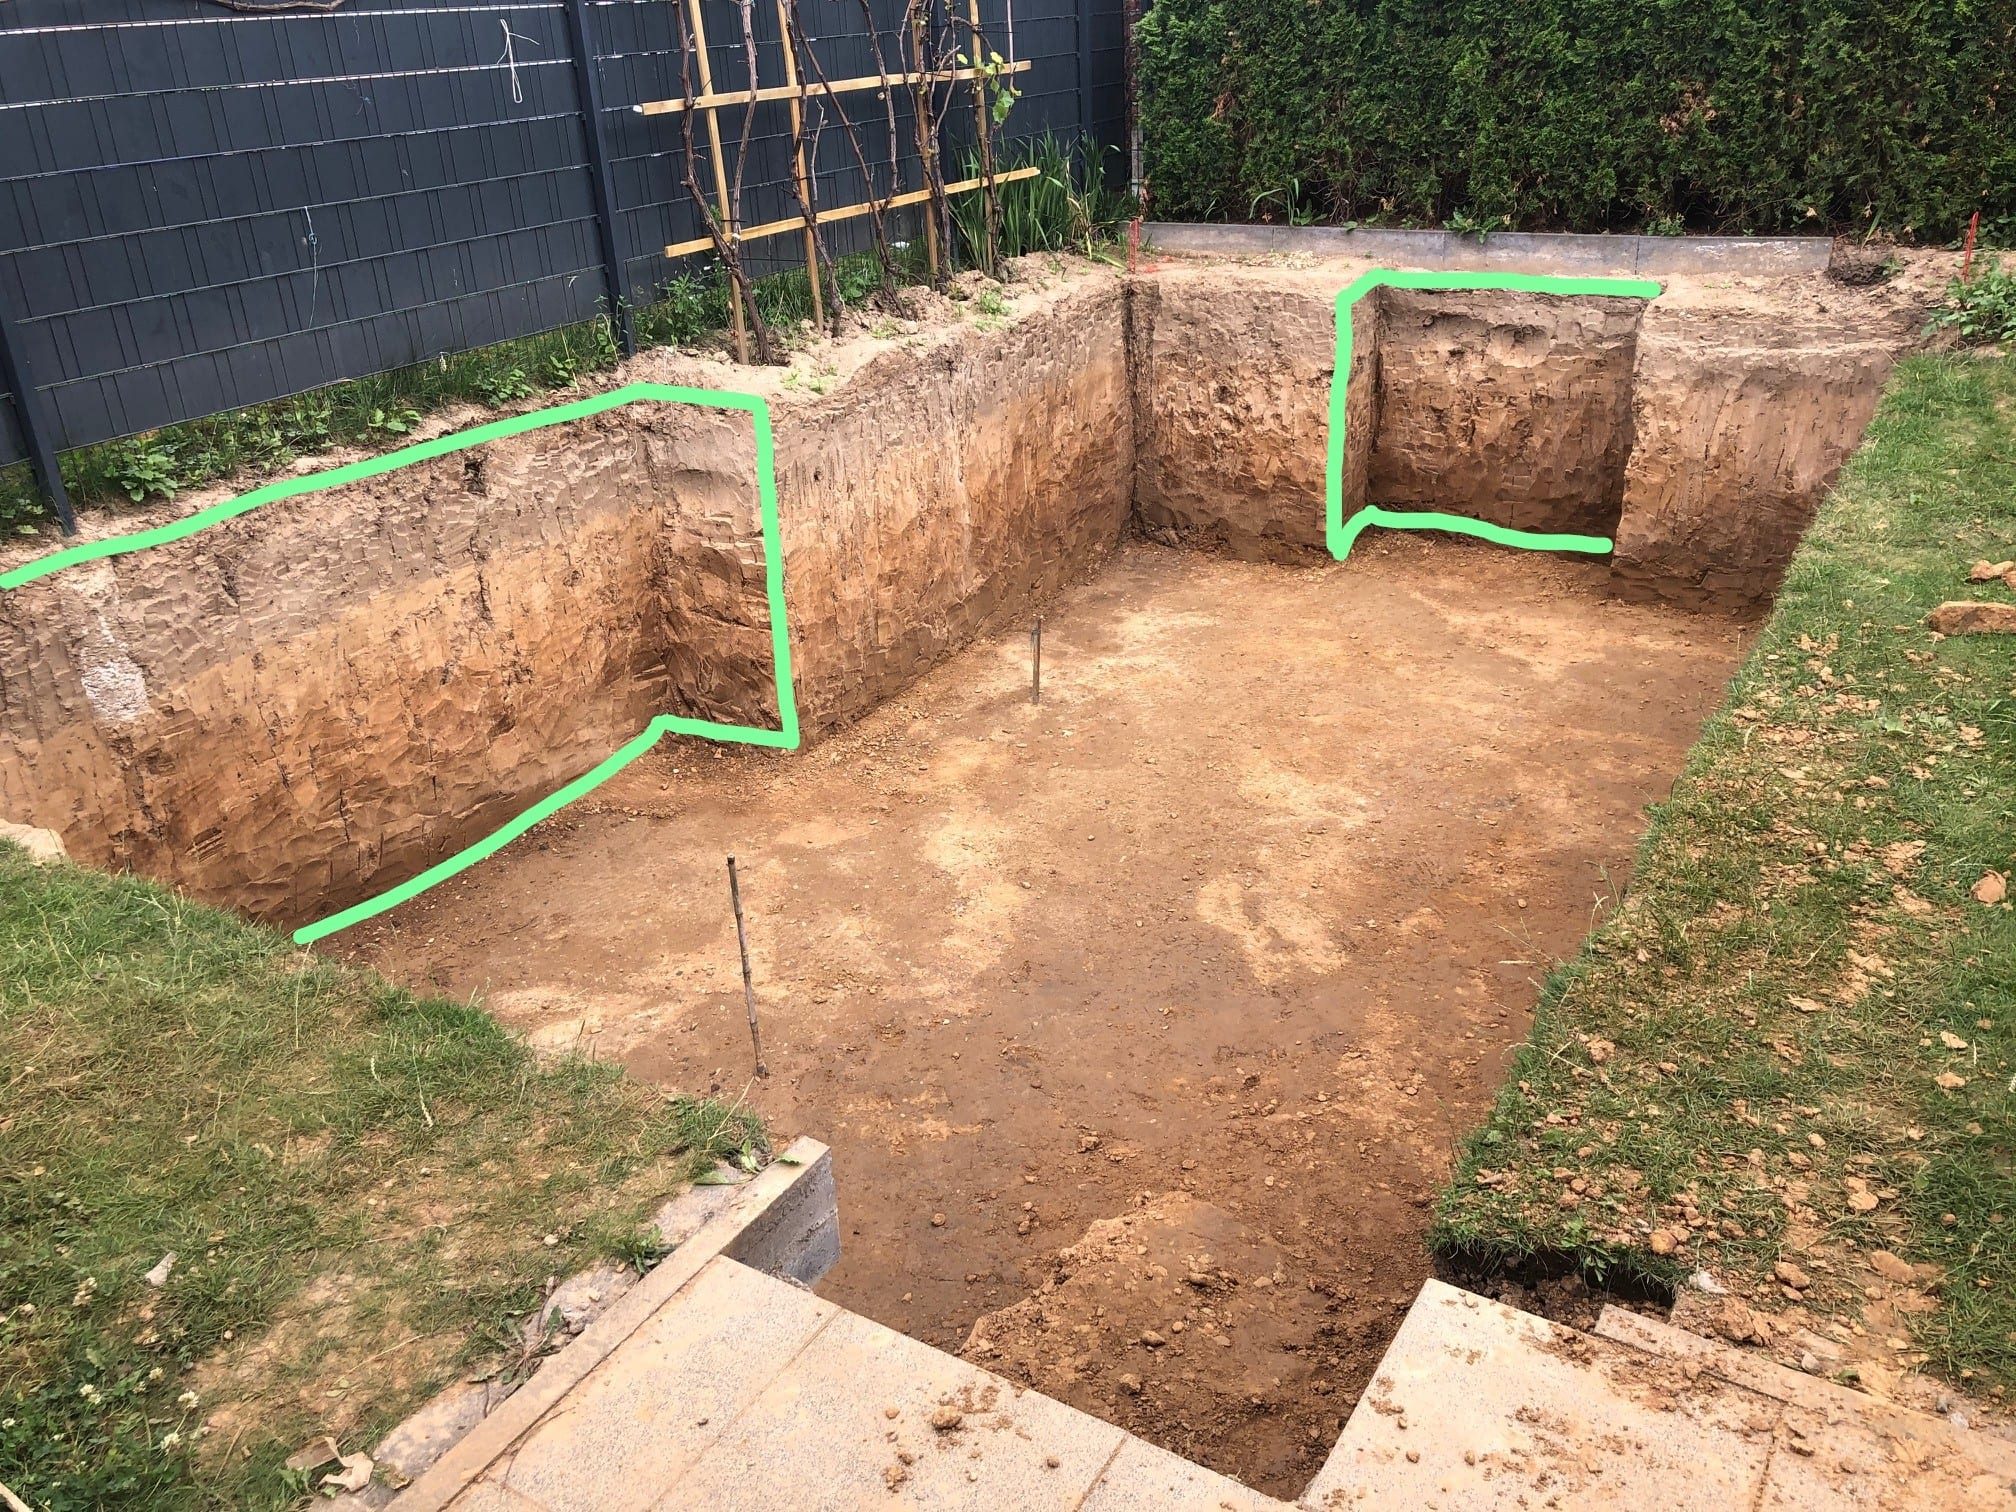 Baugrube nach Erdaushub